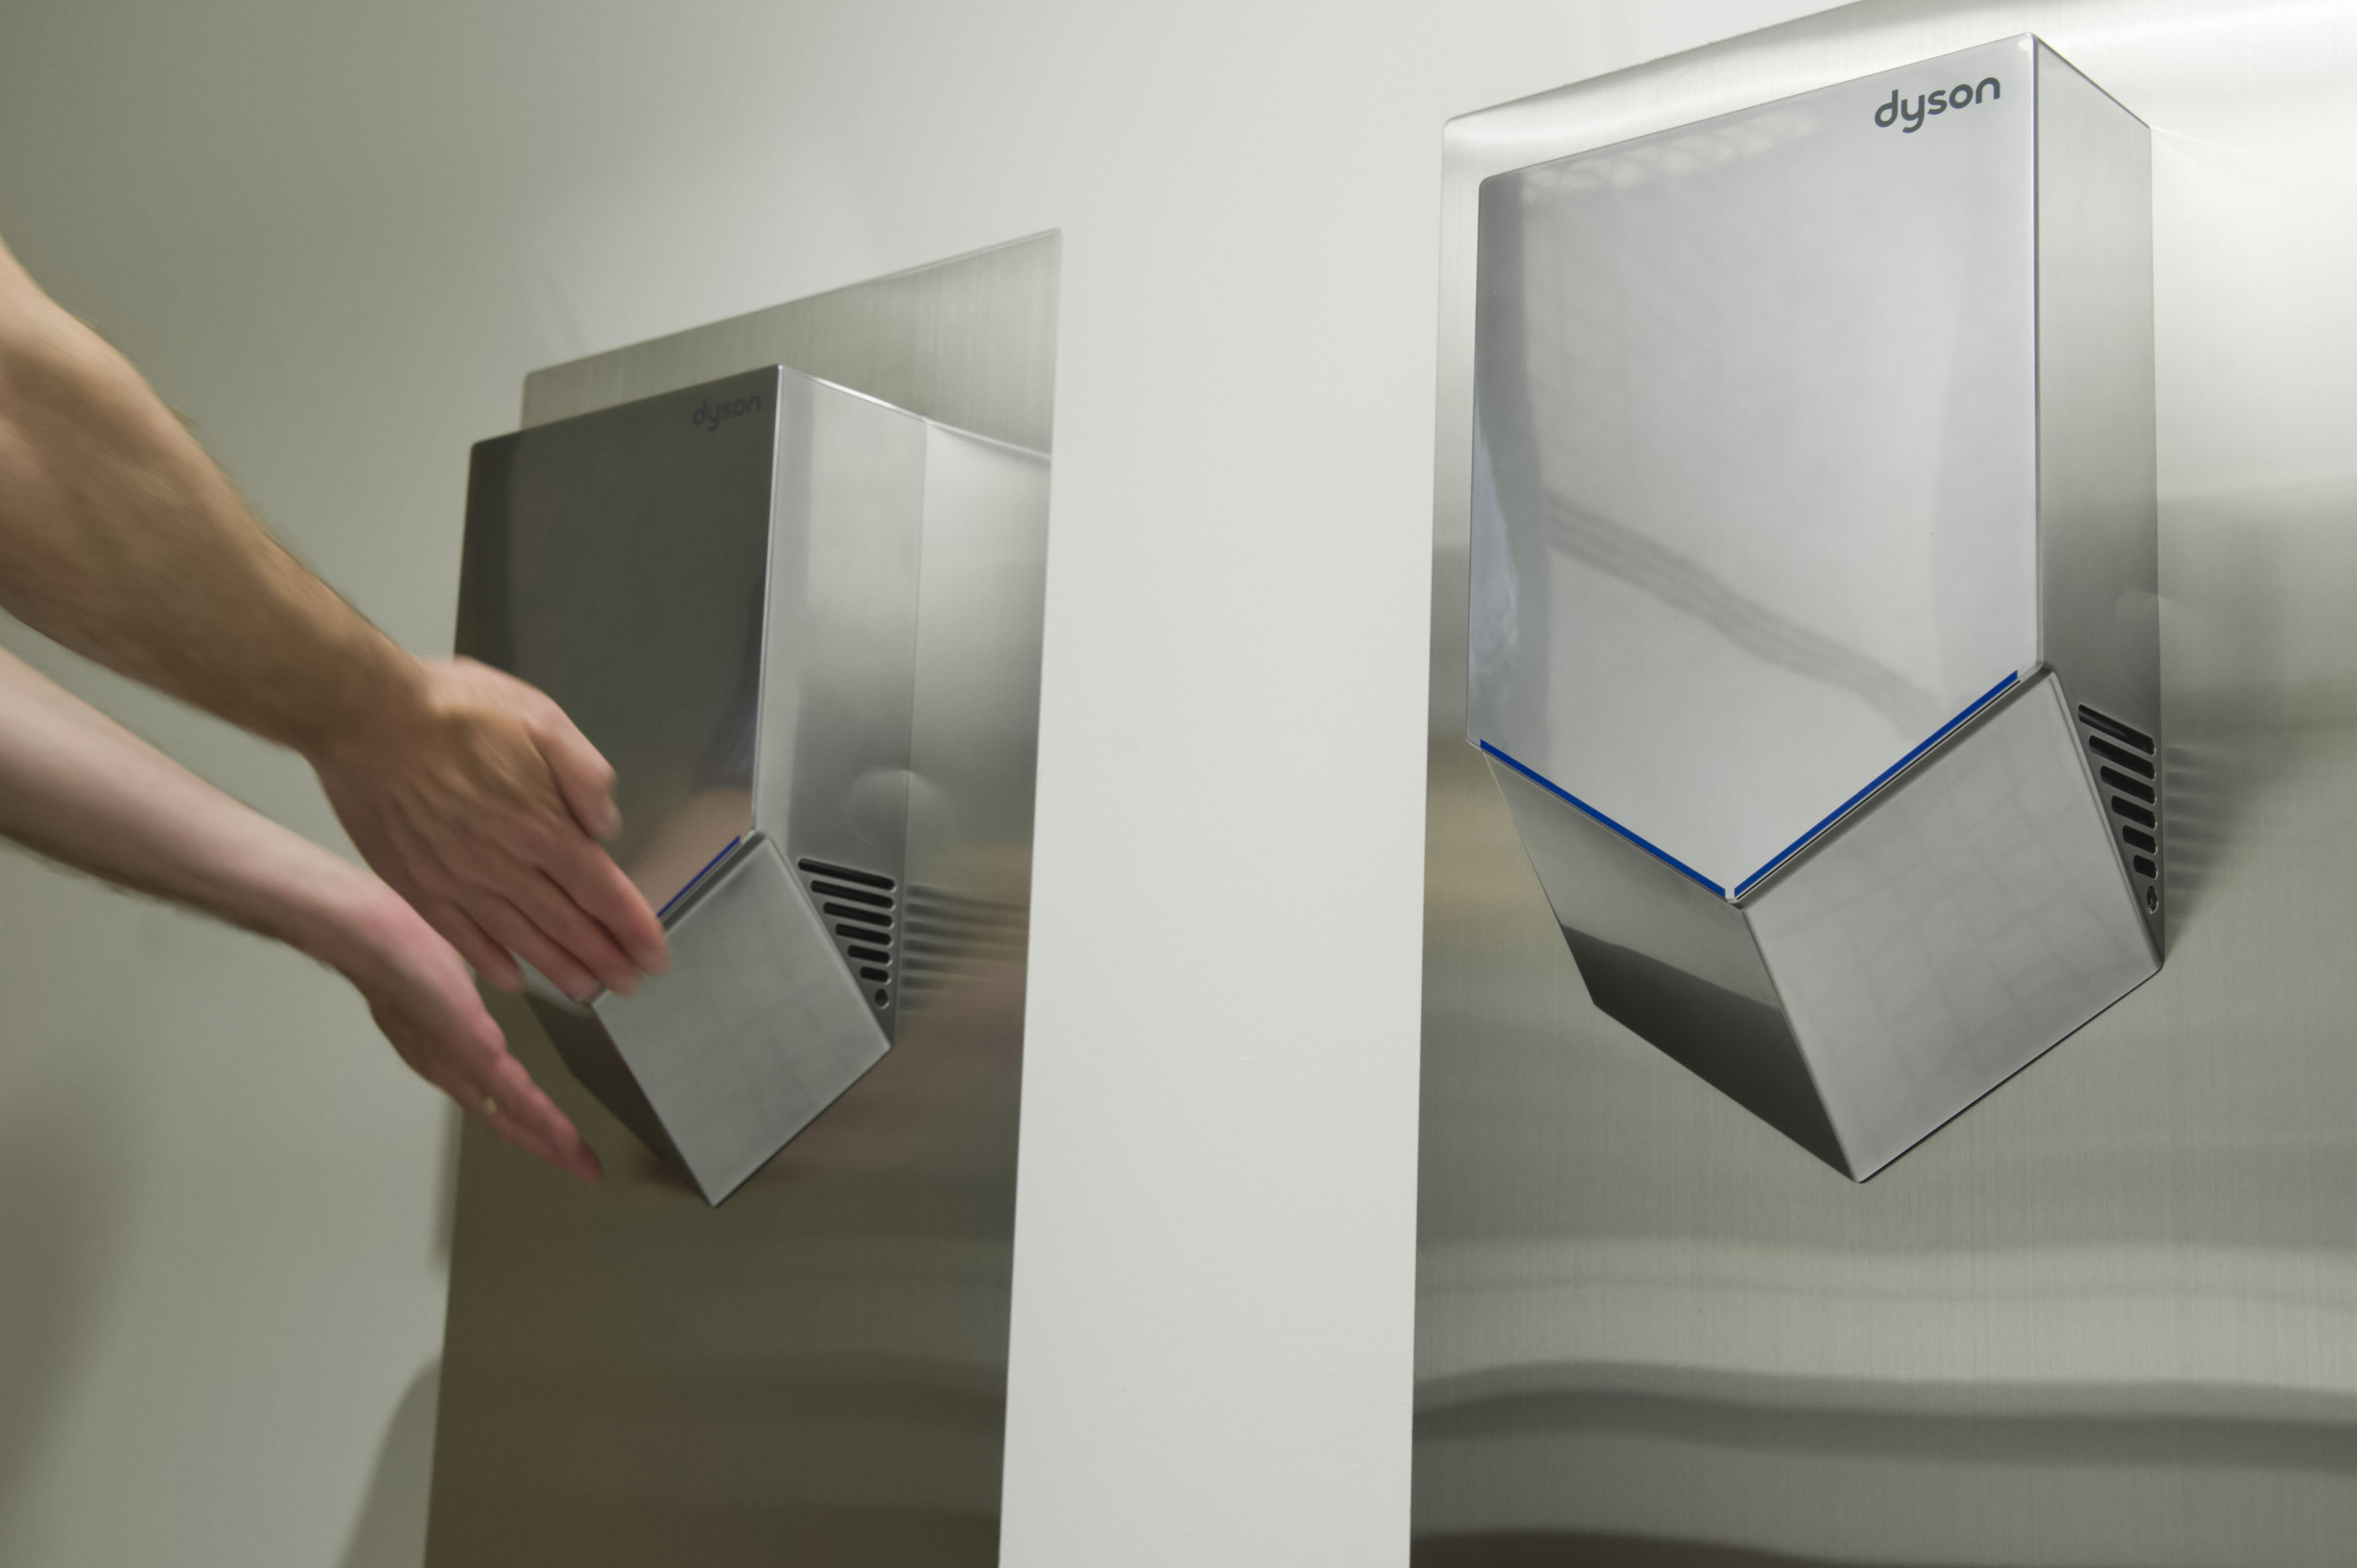 Dyson hand dryers airblade v dyson dc41c allergy цены